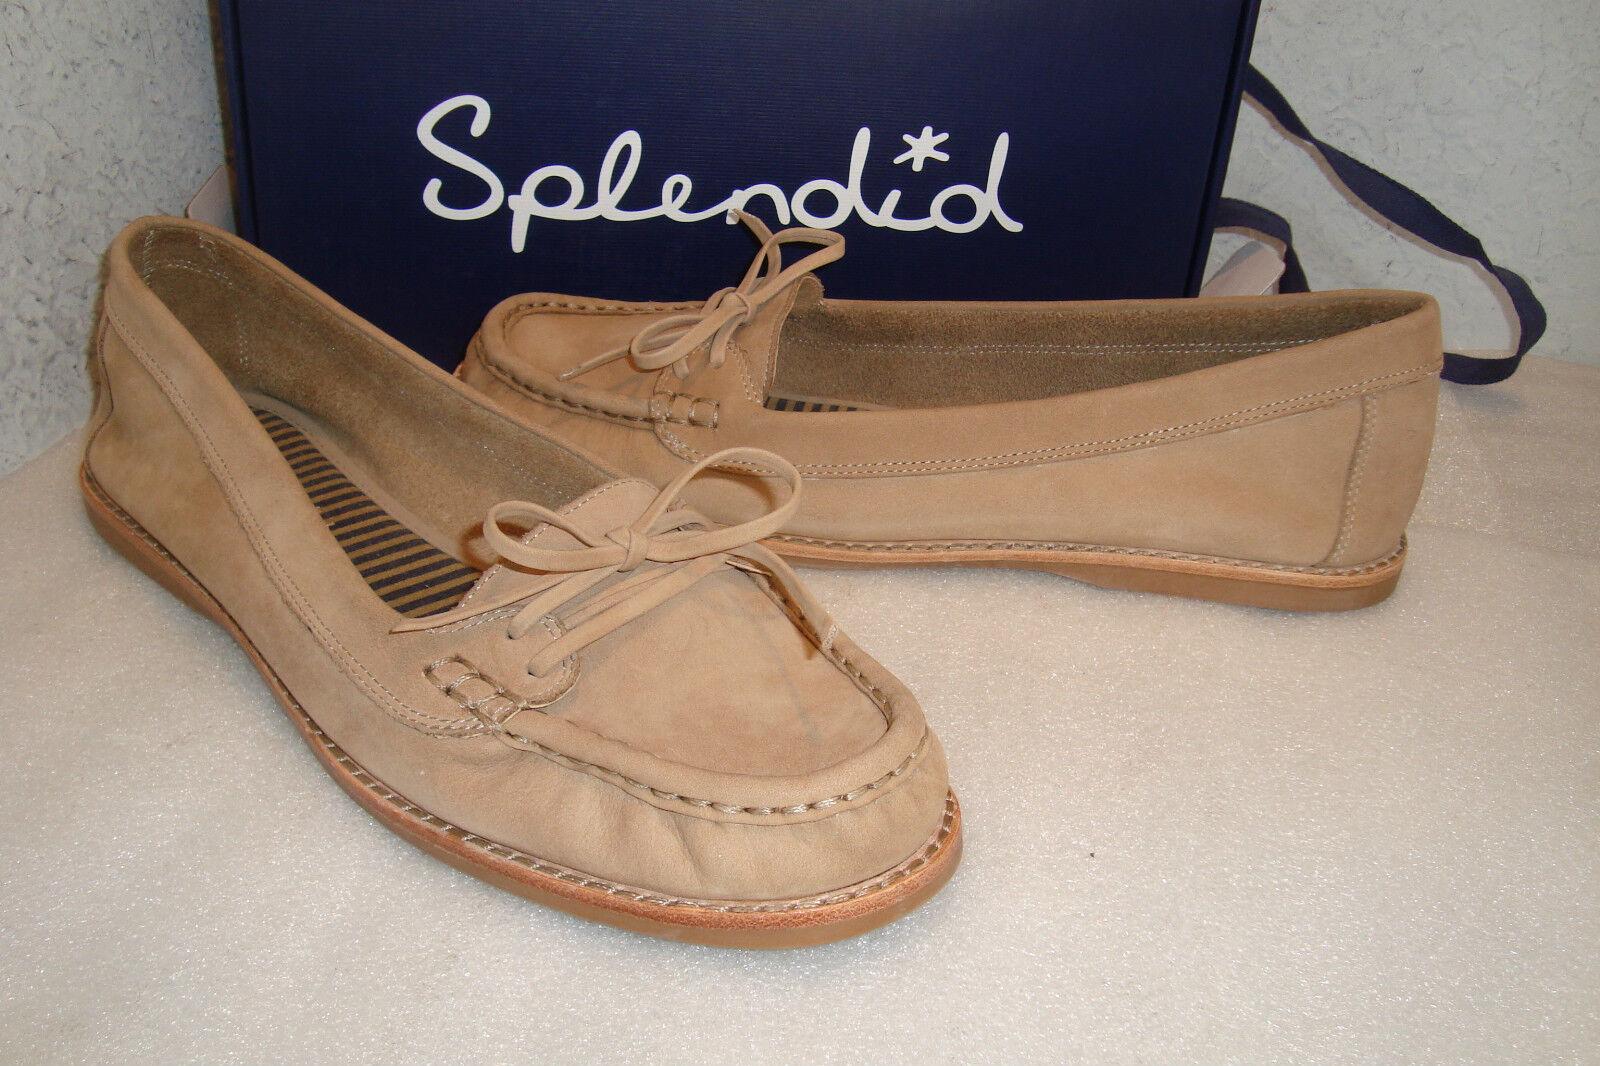 Splendid Footwear Damenschuhe NWB Breakwater Sand Casual Flats Schuhes 10 MED NEU